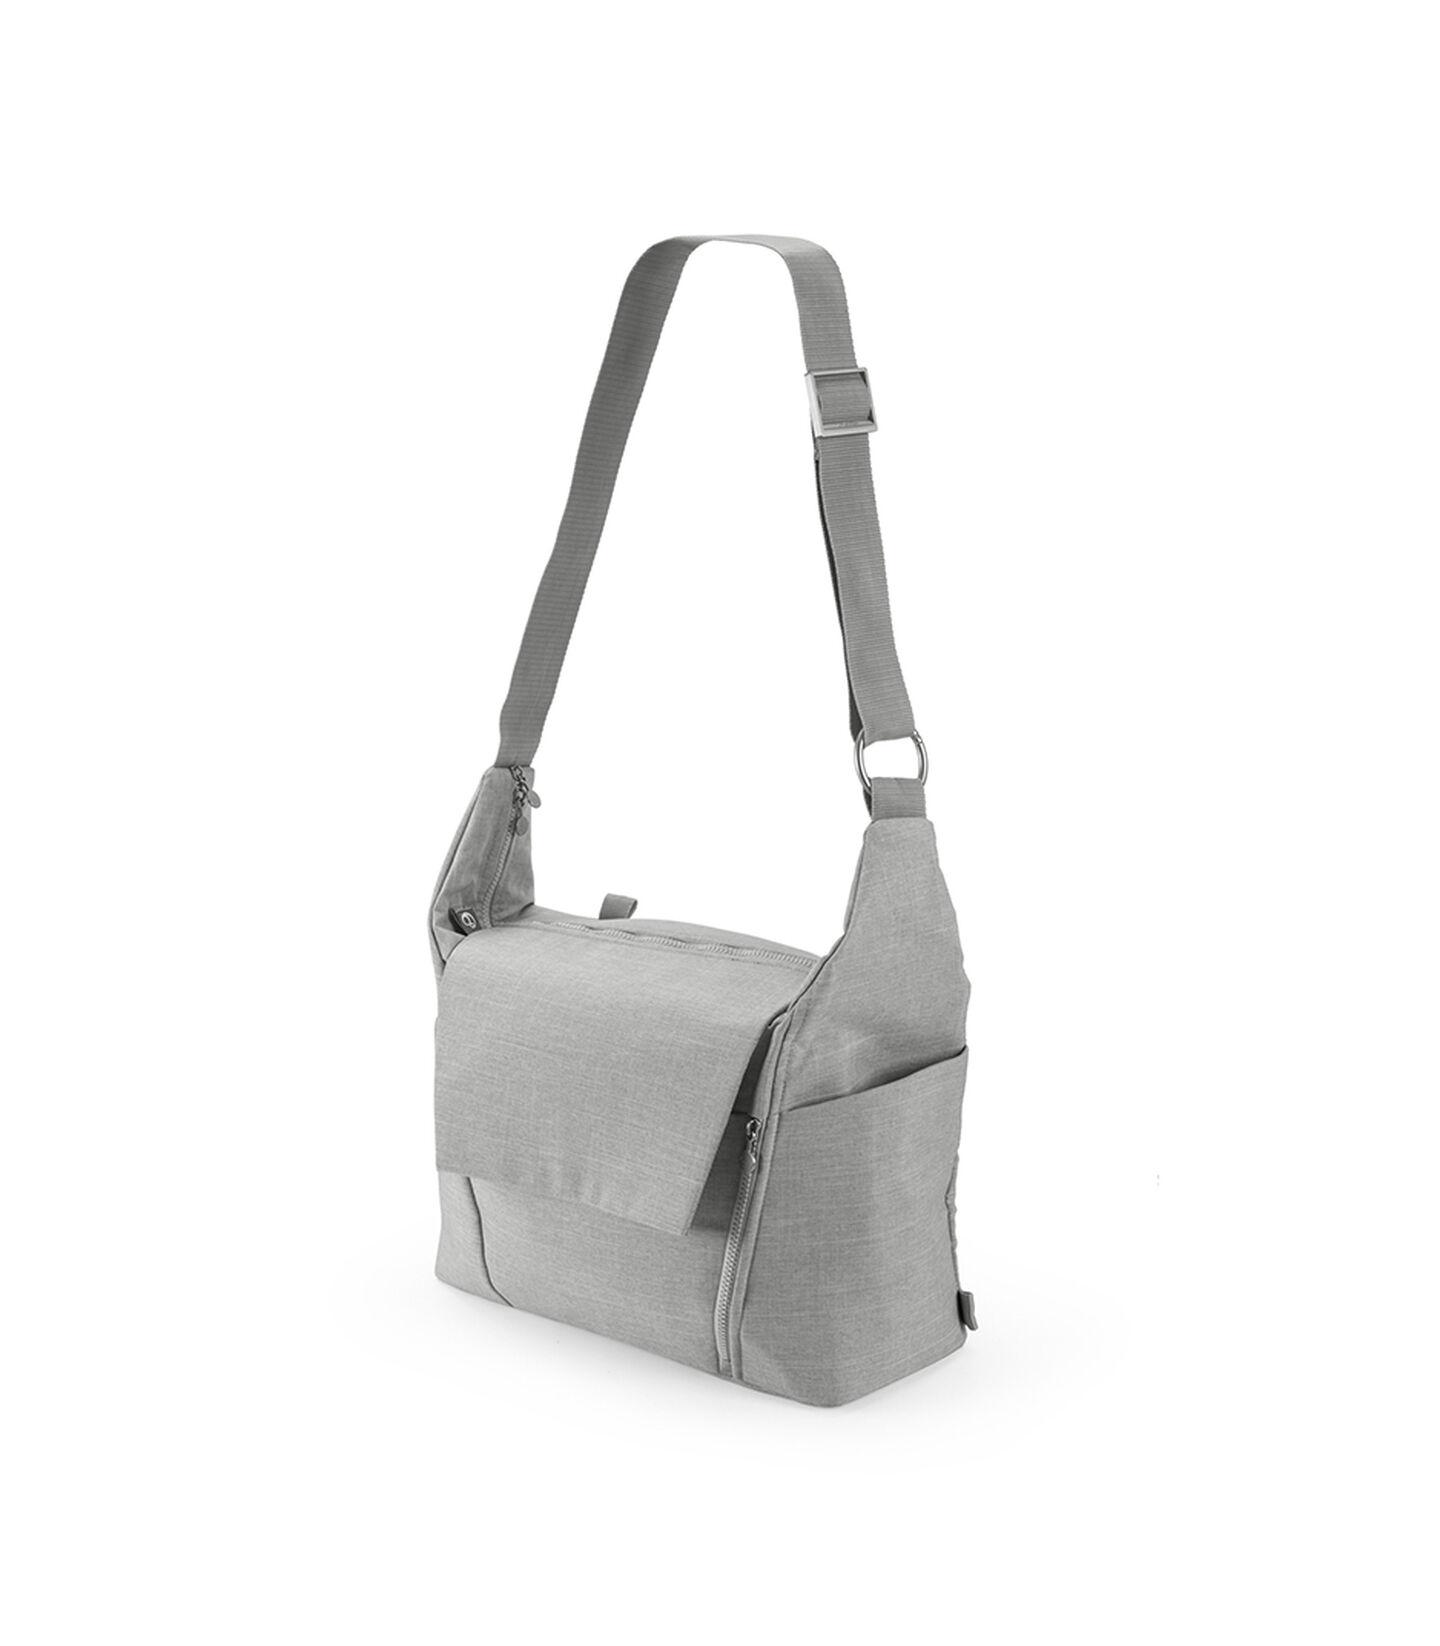 Stokke® Wickeltasche in Grey Melange, Grey Melange, mainview view 4